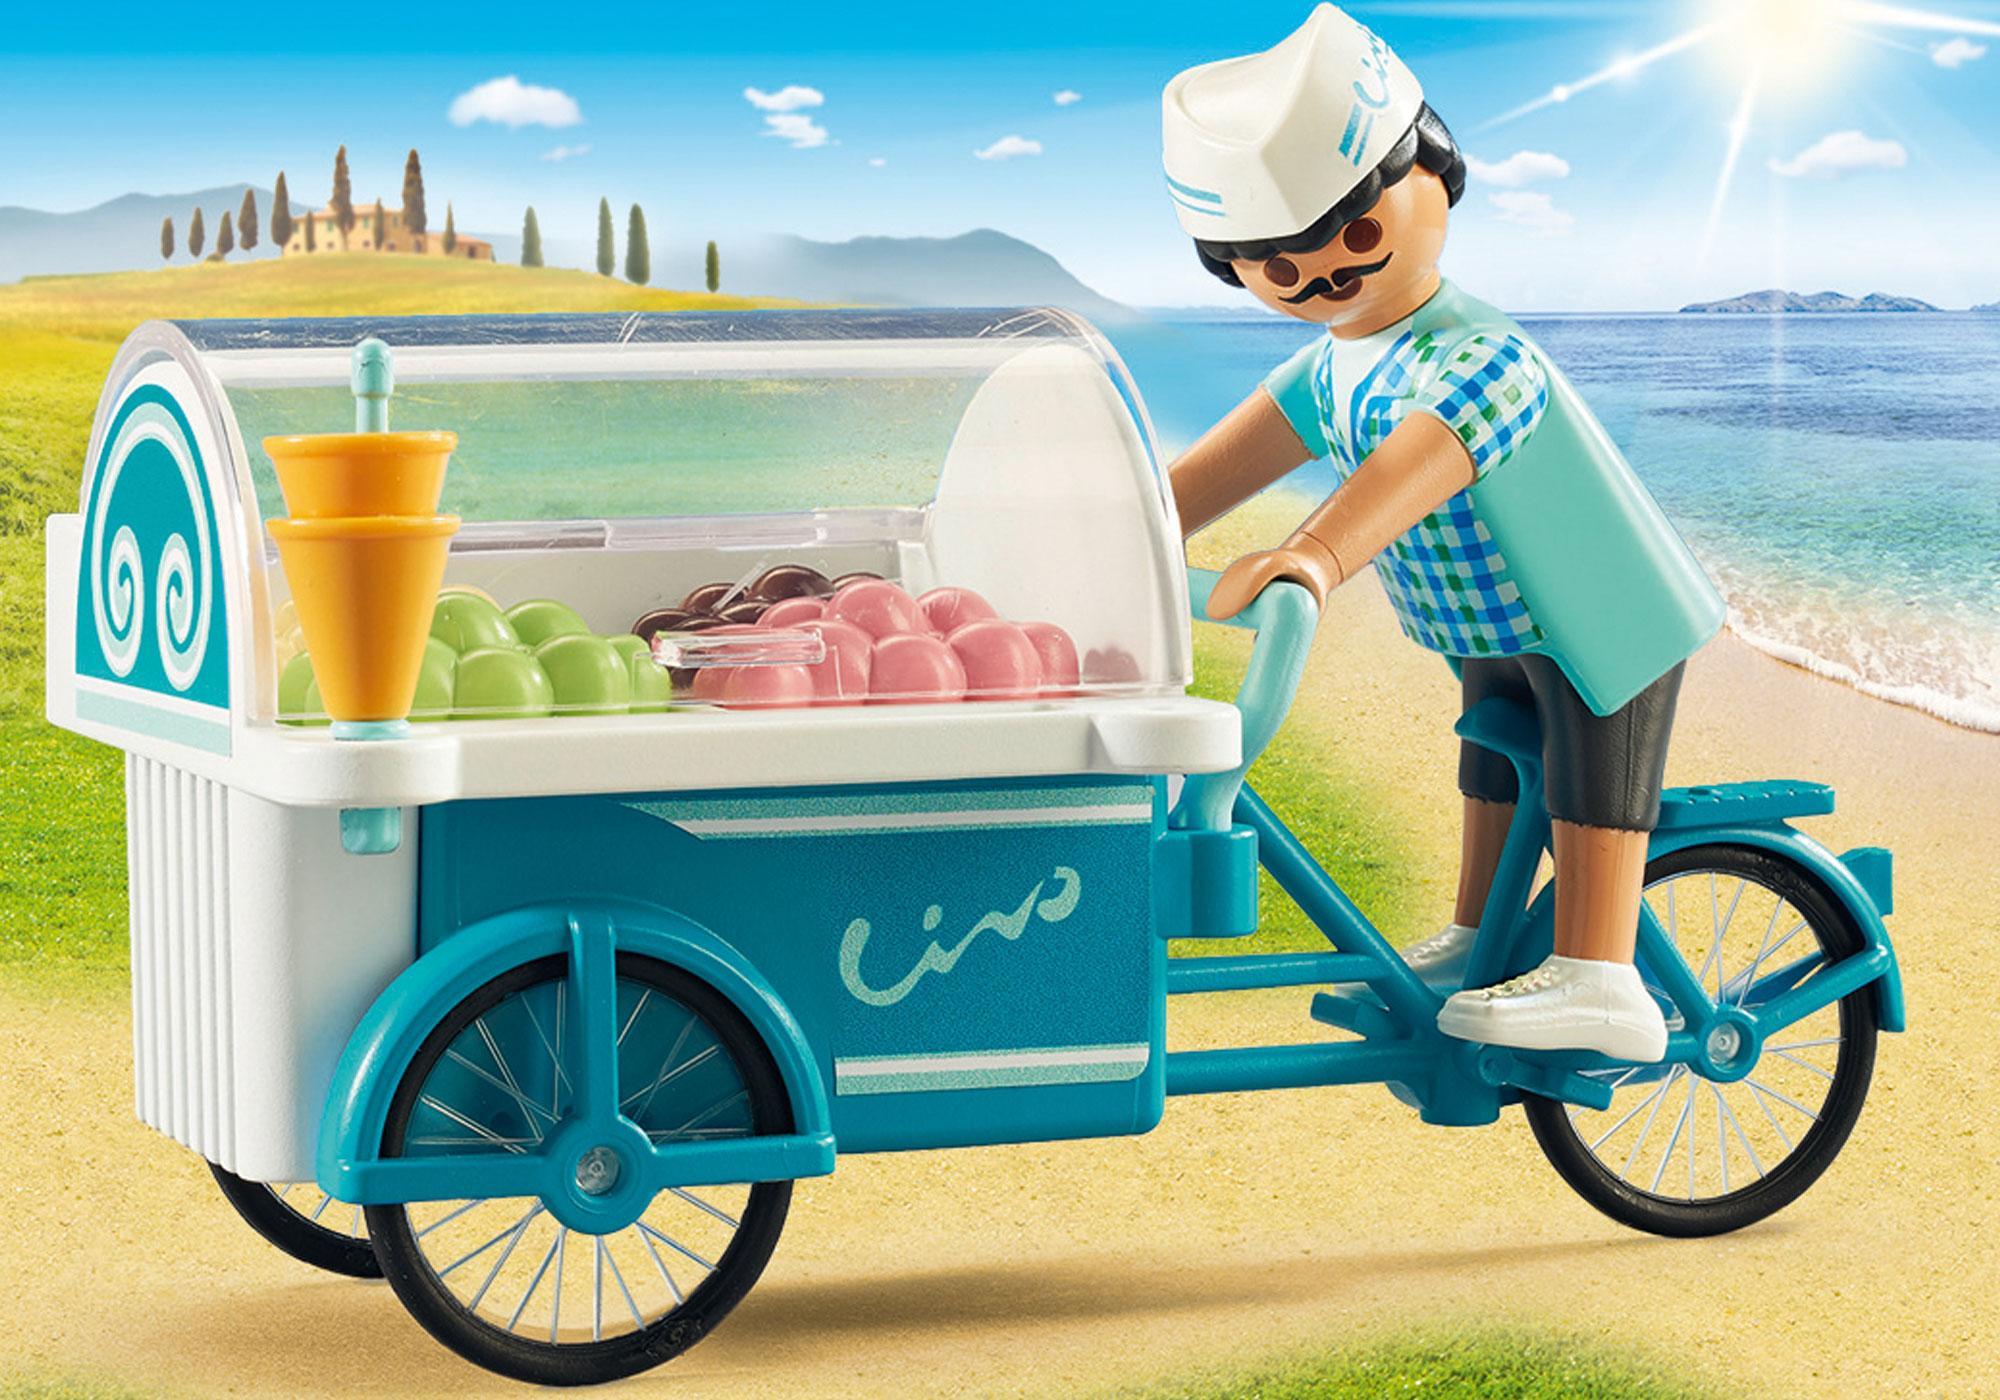 http://media.playmobil.com/i/playmobil/9426_product_extra1/Ice Cream Cart